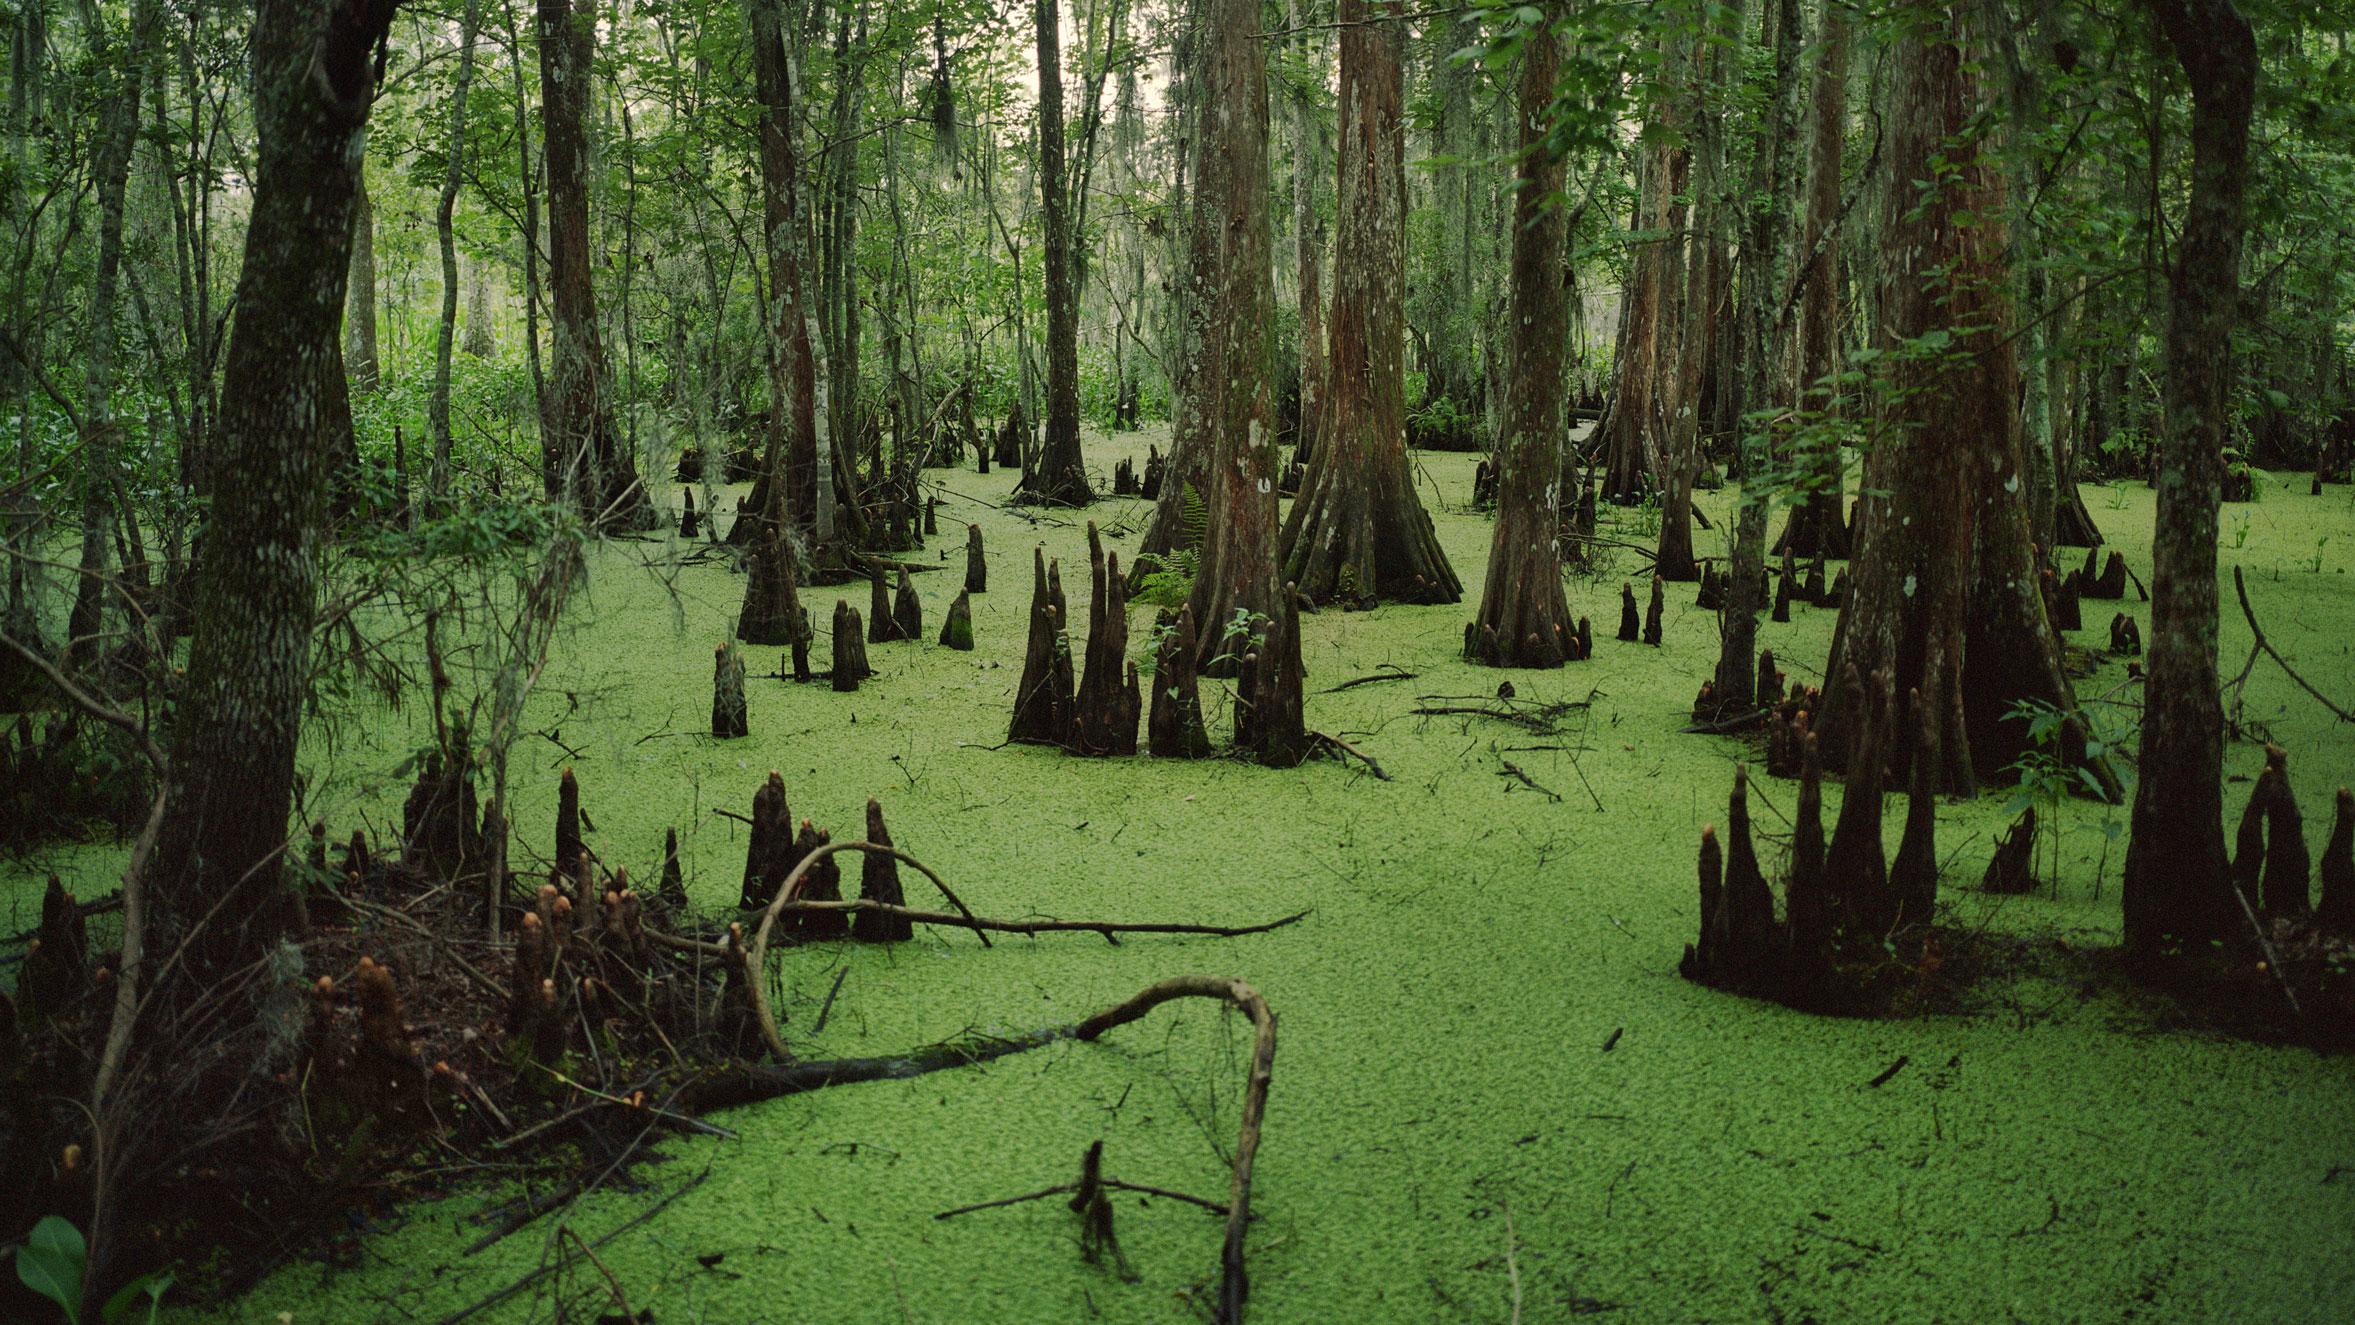 Drain the swamp | TechCrunch